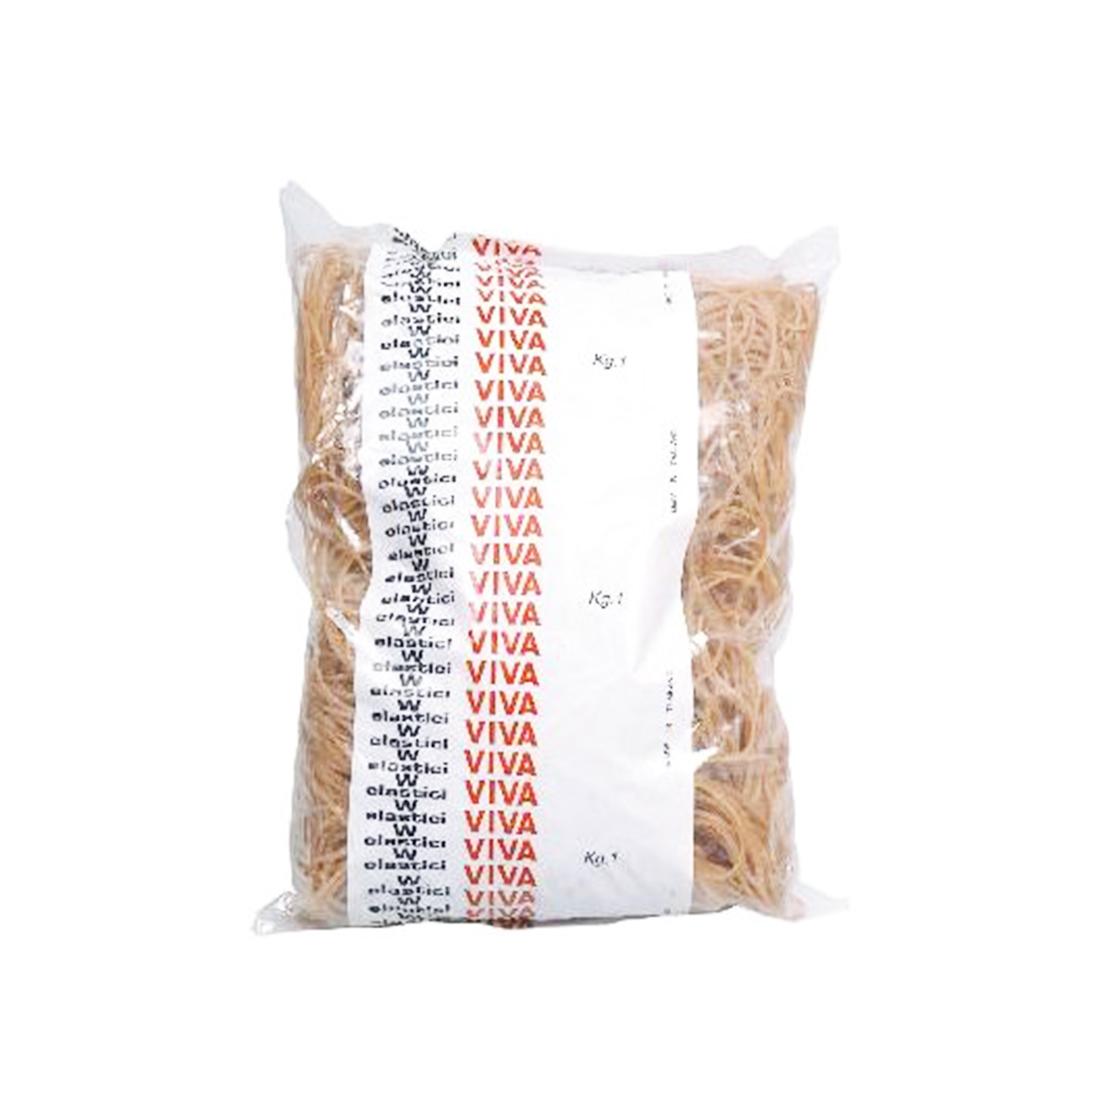 ELASTICI PARA IN BUSTA 20mm 1kg